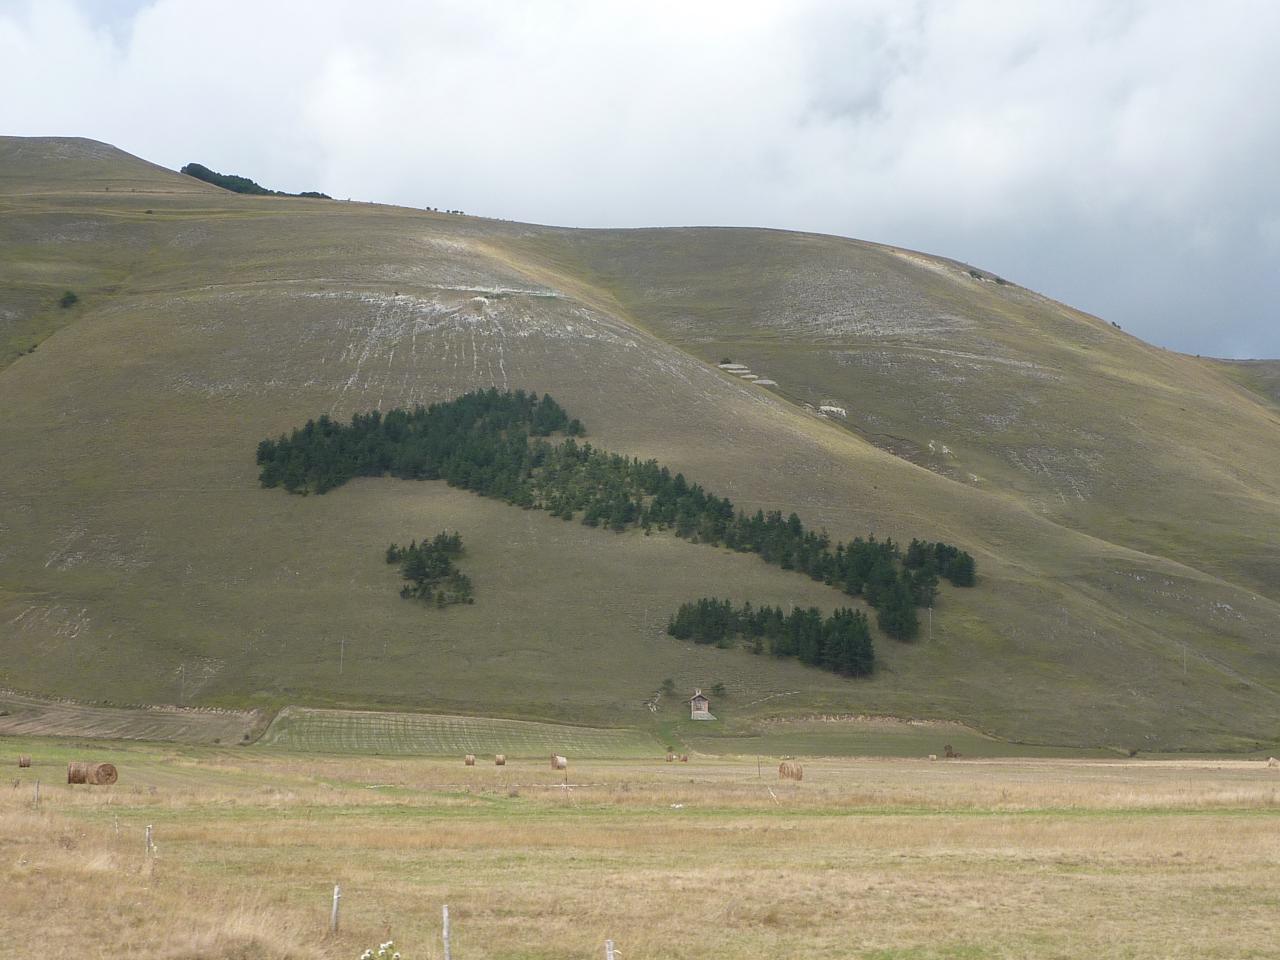 2014 09 - Délégation à Gualdo - Castellucio di Norcia